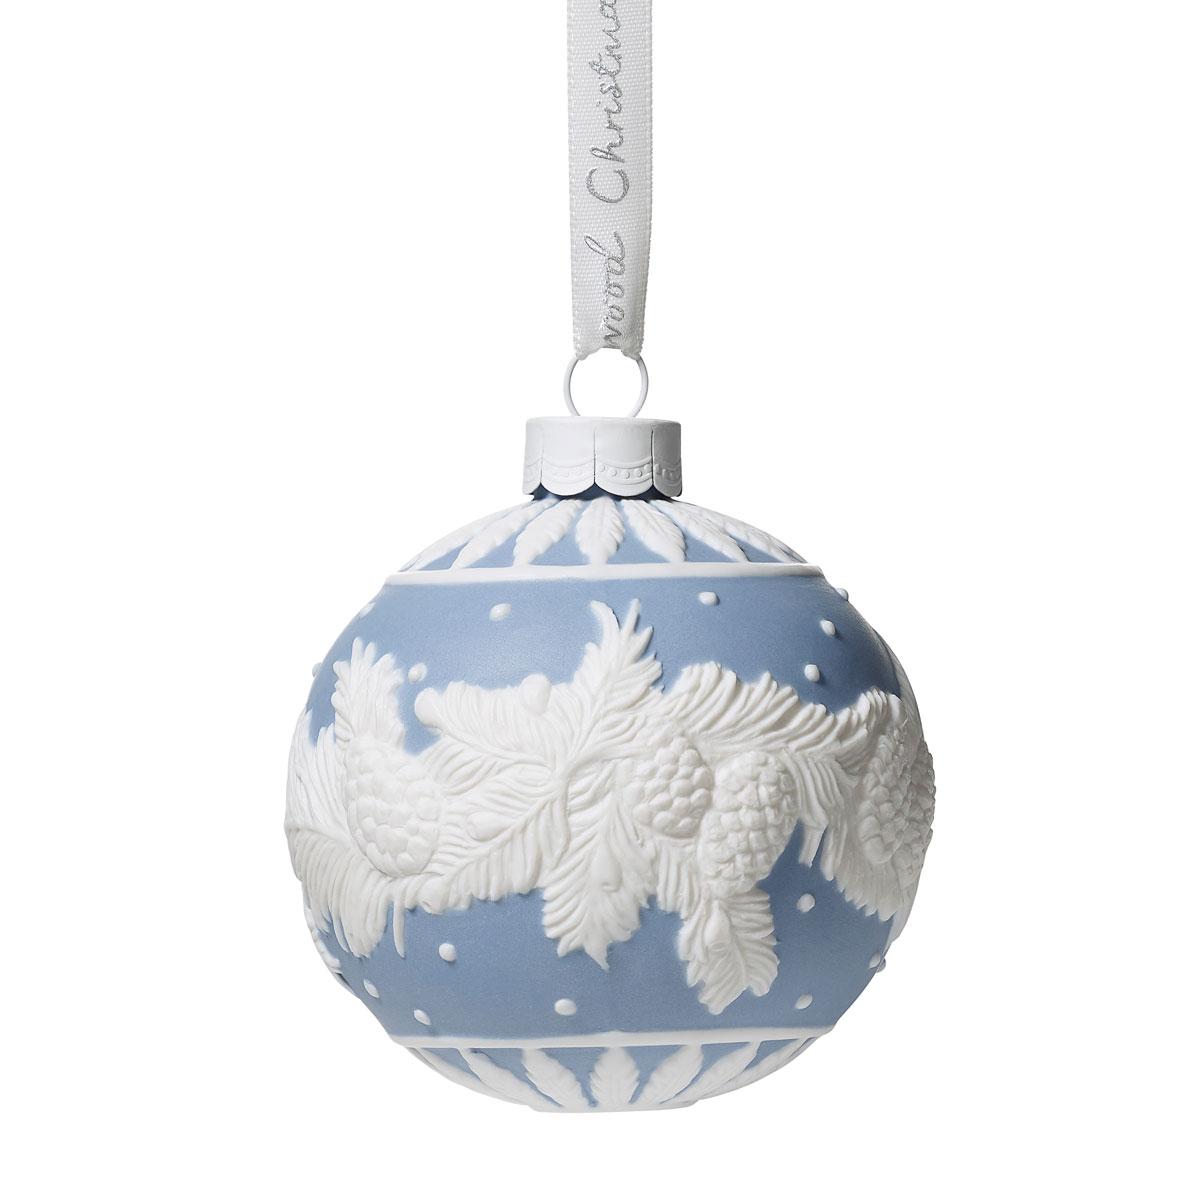 Wedgwood 2019 Winter Pine Christmas Ornament